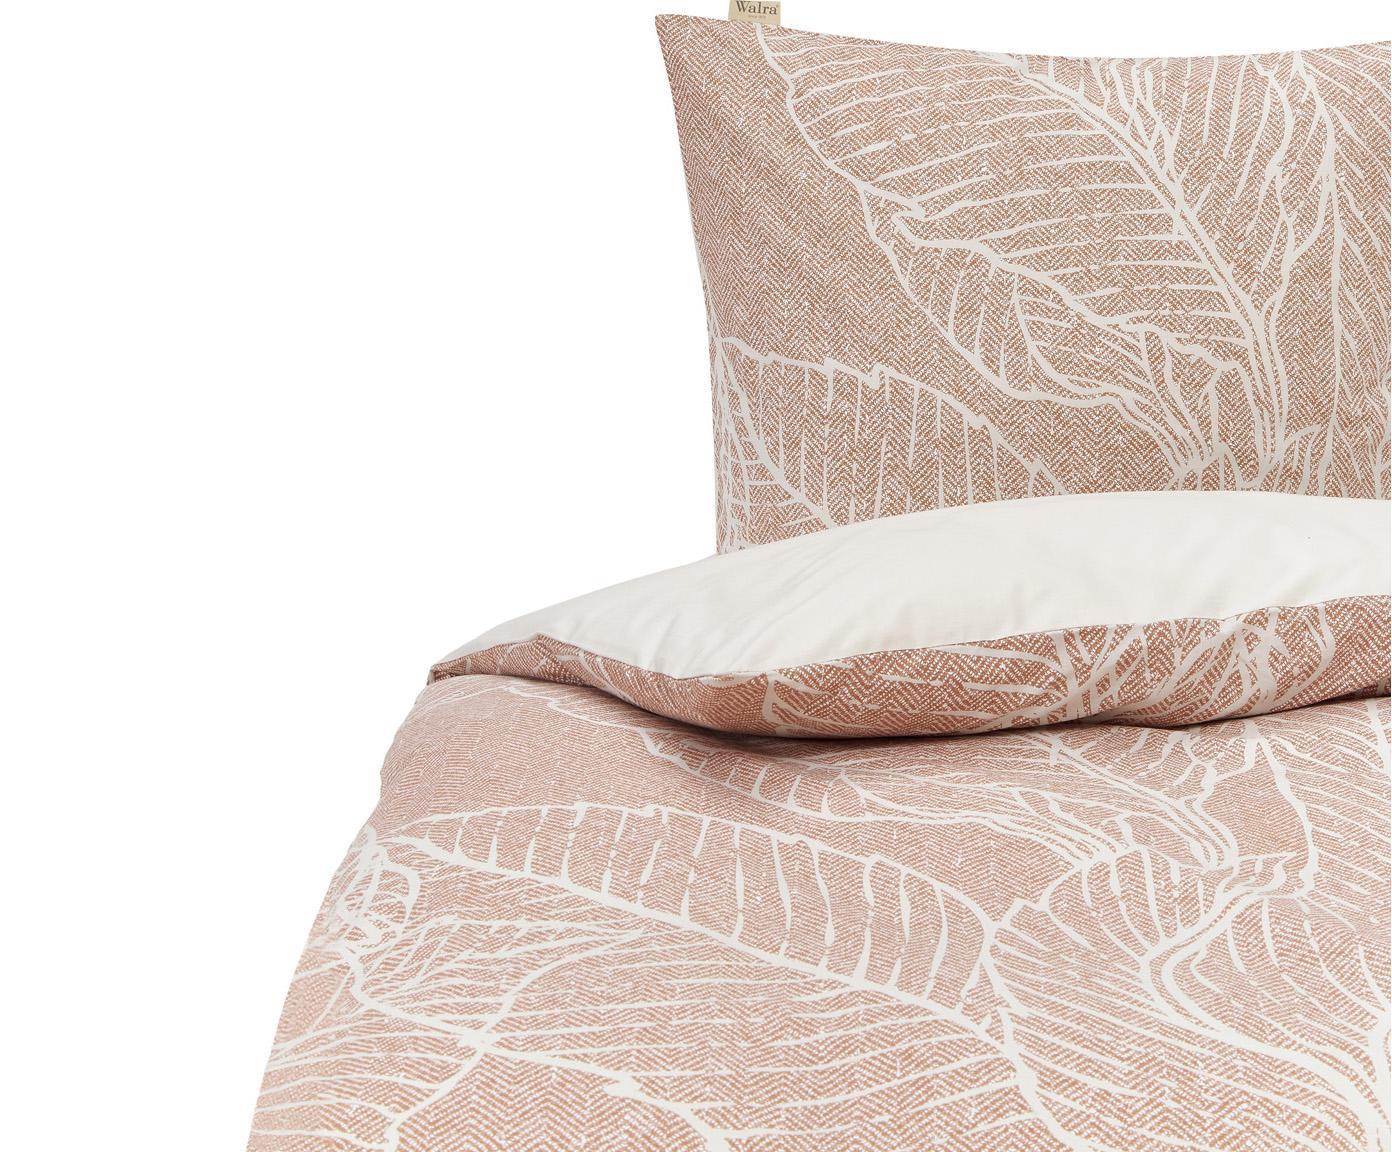 Baumwoll-Bettwäsche Leaves & Trees, Webart: Renforcé Renforcé besteht, Altrosa, Hellbeige, 135 x 200 cm + 1 Kissen 80 x 80 cm